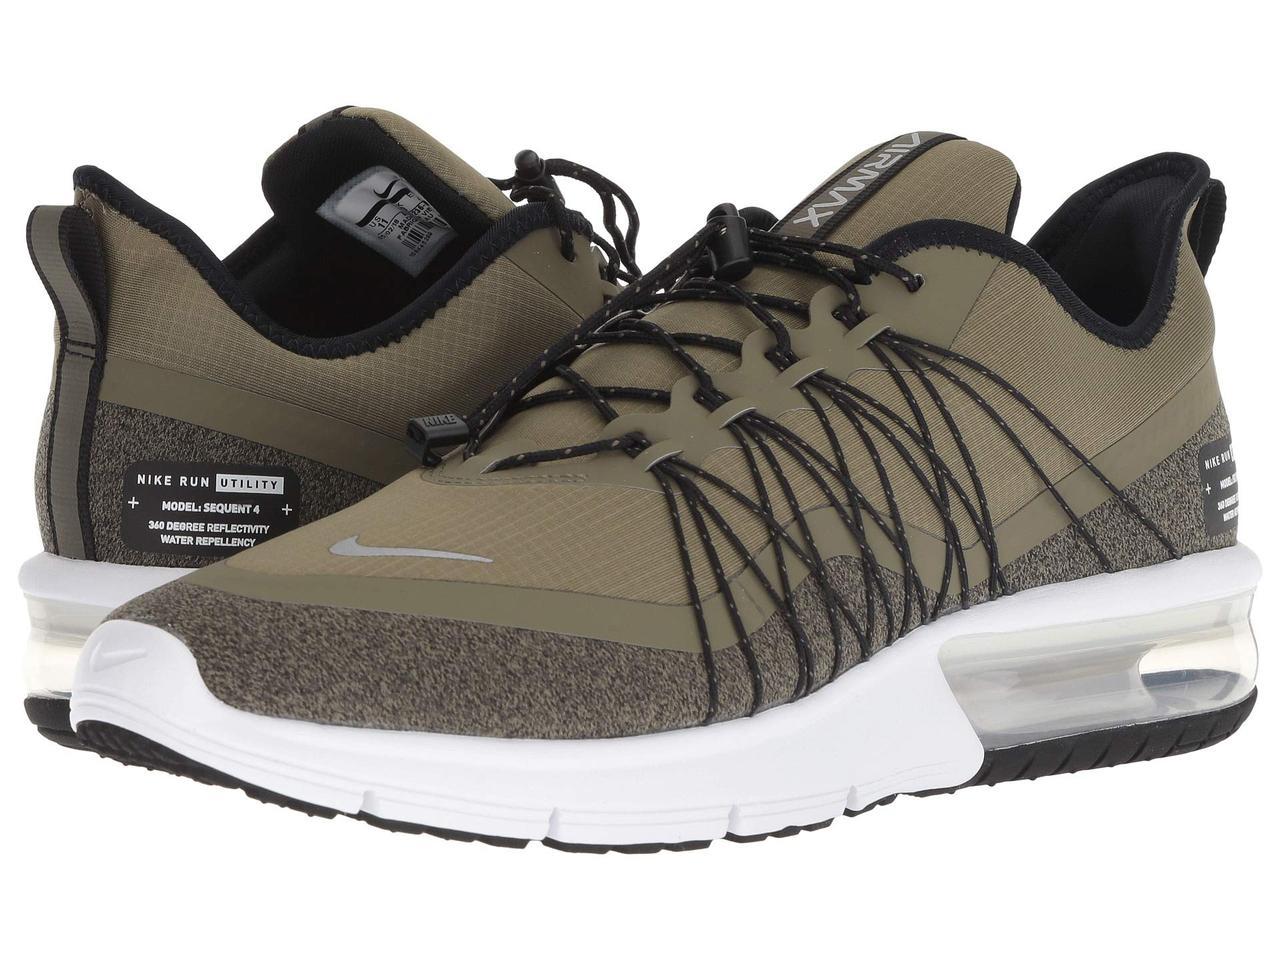 sale retailer b688b 2d334 Кроссовки Кеды (Оригинал) Nike Air Max Sequent 4 Shield Medium  Olive Metallic